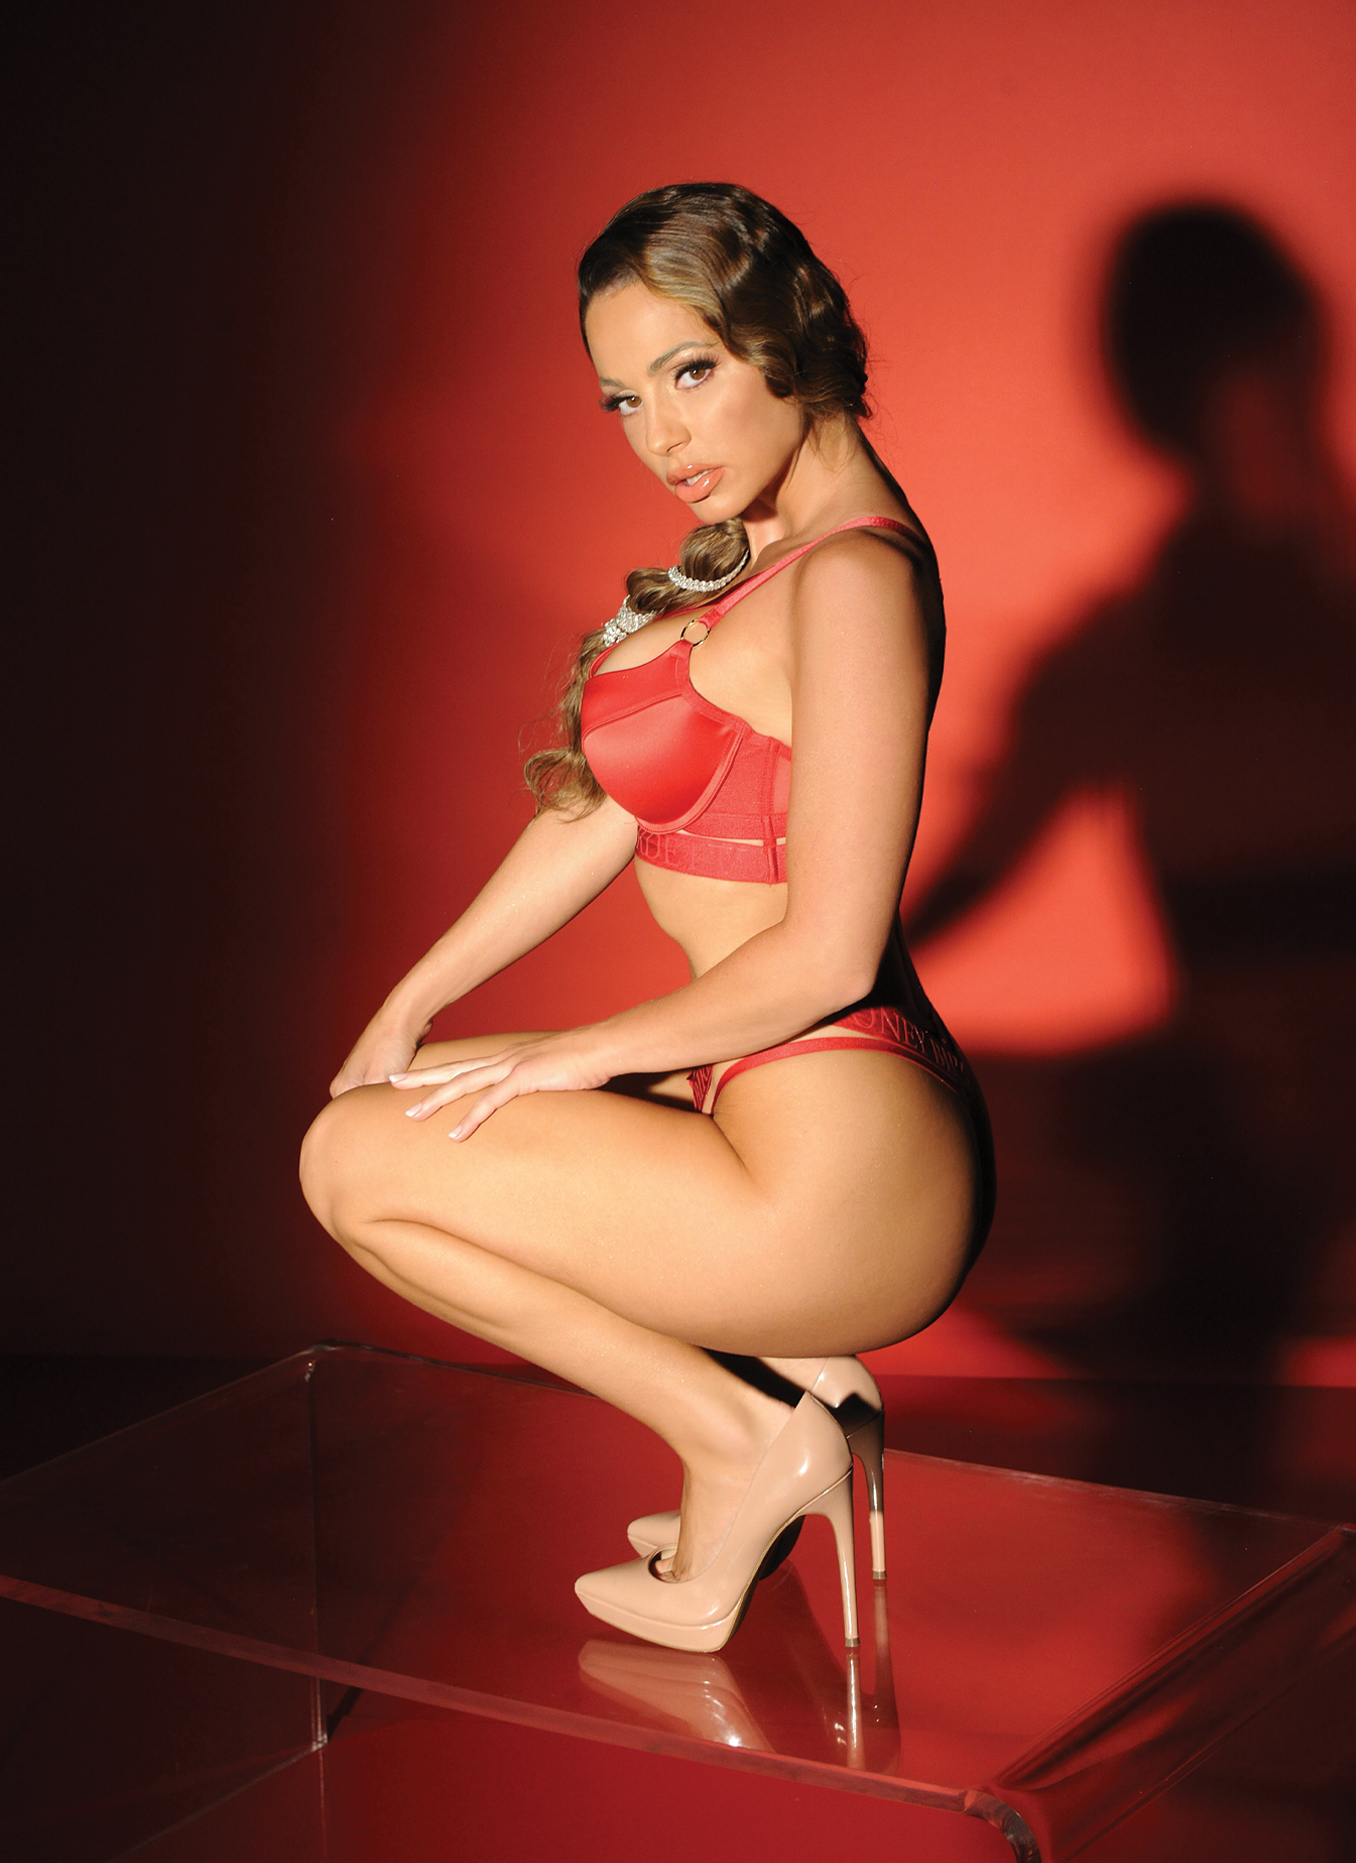 Abigail Mac Porn Happy Verday all about abigail mac: bankable star a director's dream | avn